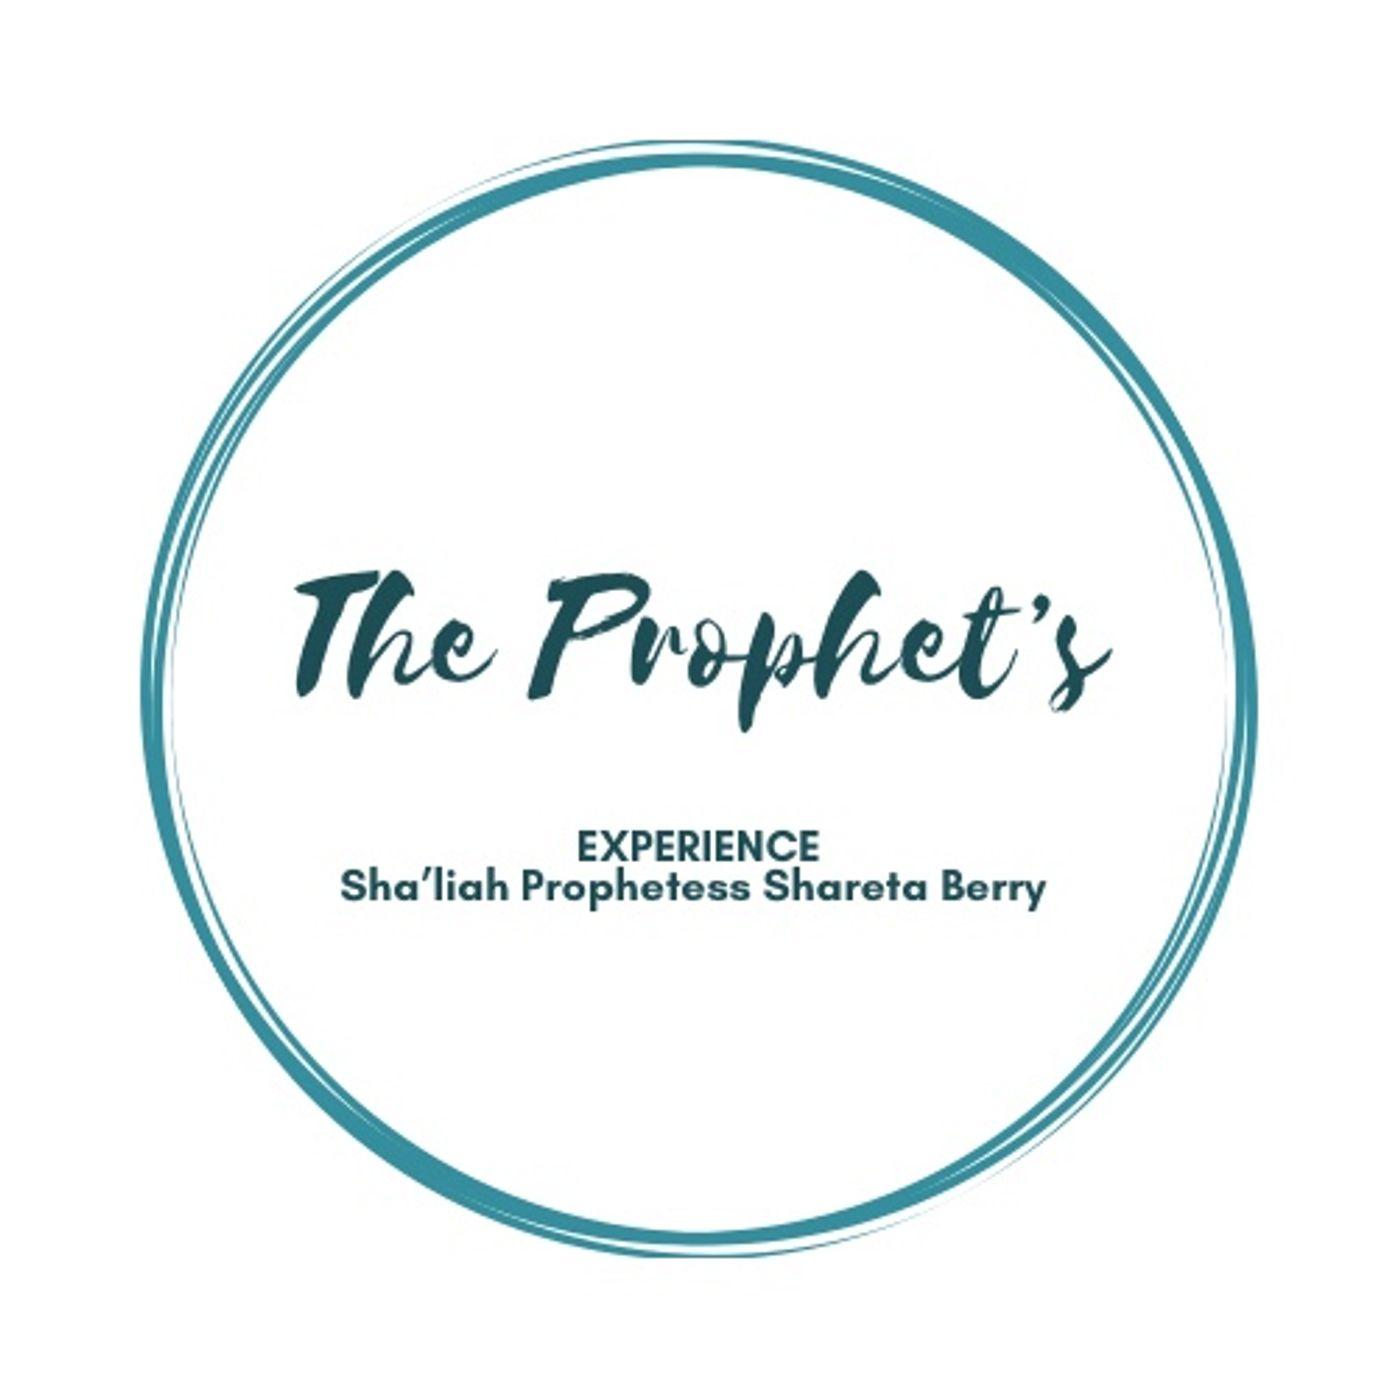 The Prophet's Experience